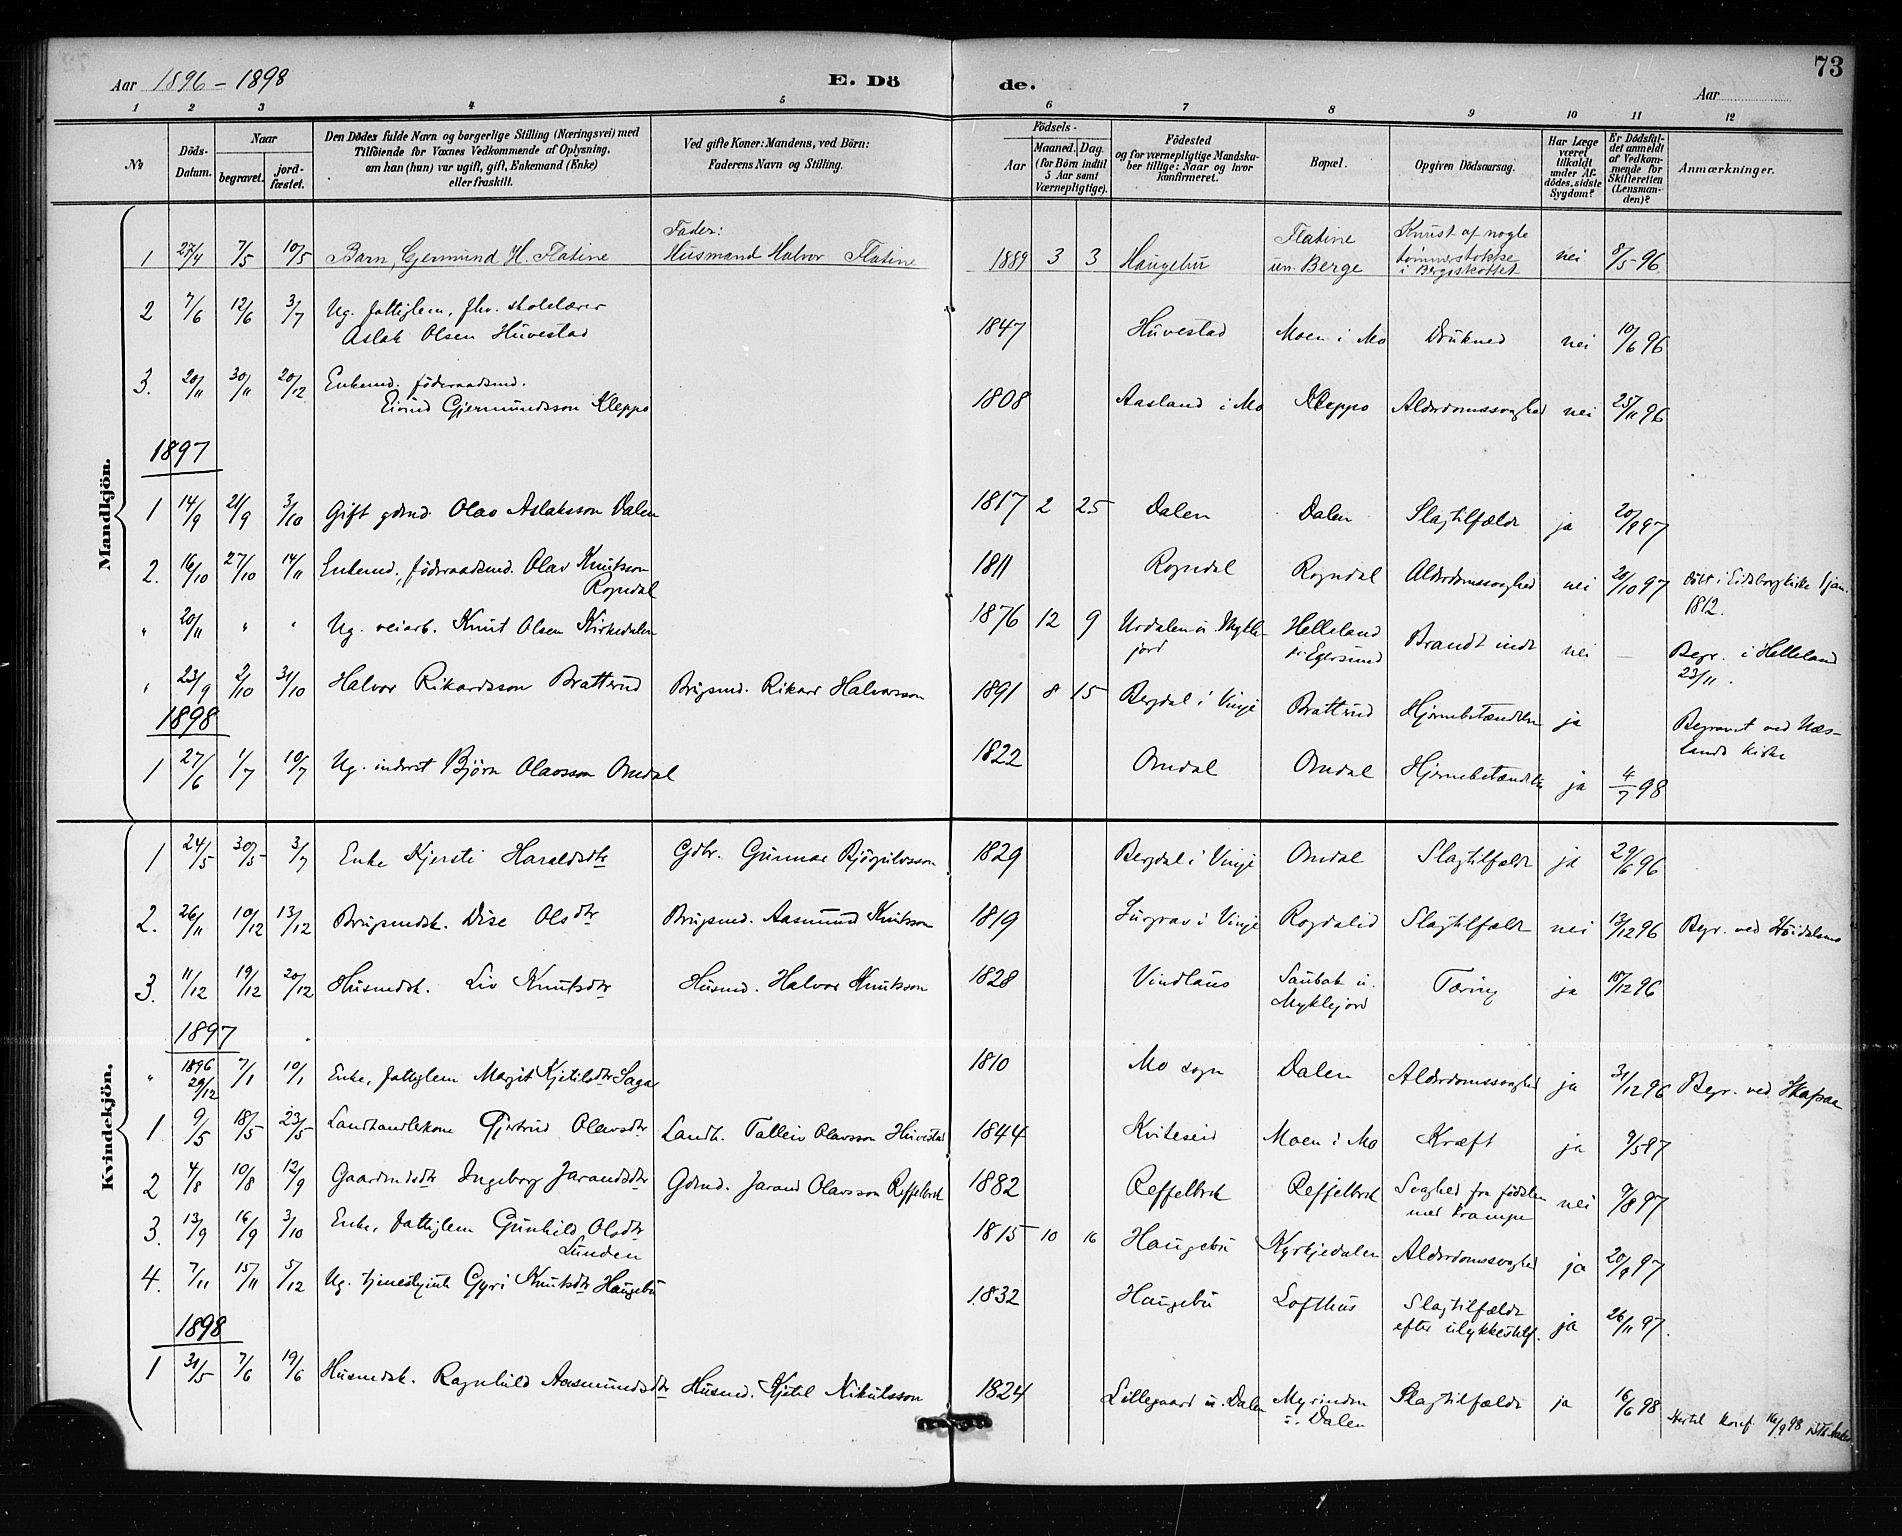 SAKO, Lårdal kirkebøker, G/Gb/L0003: Klokkerbok nr. II 3, 1889-1920, s. 73